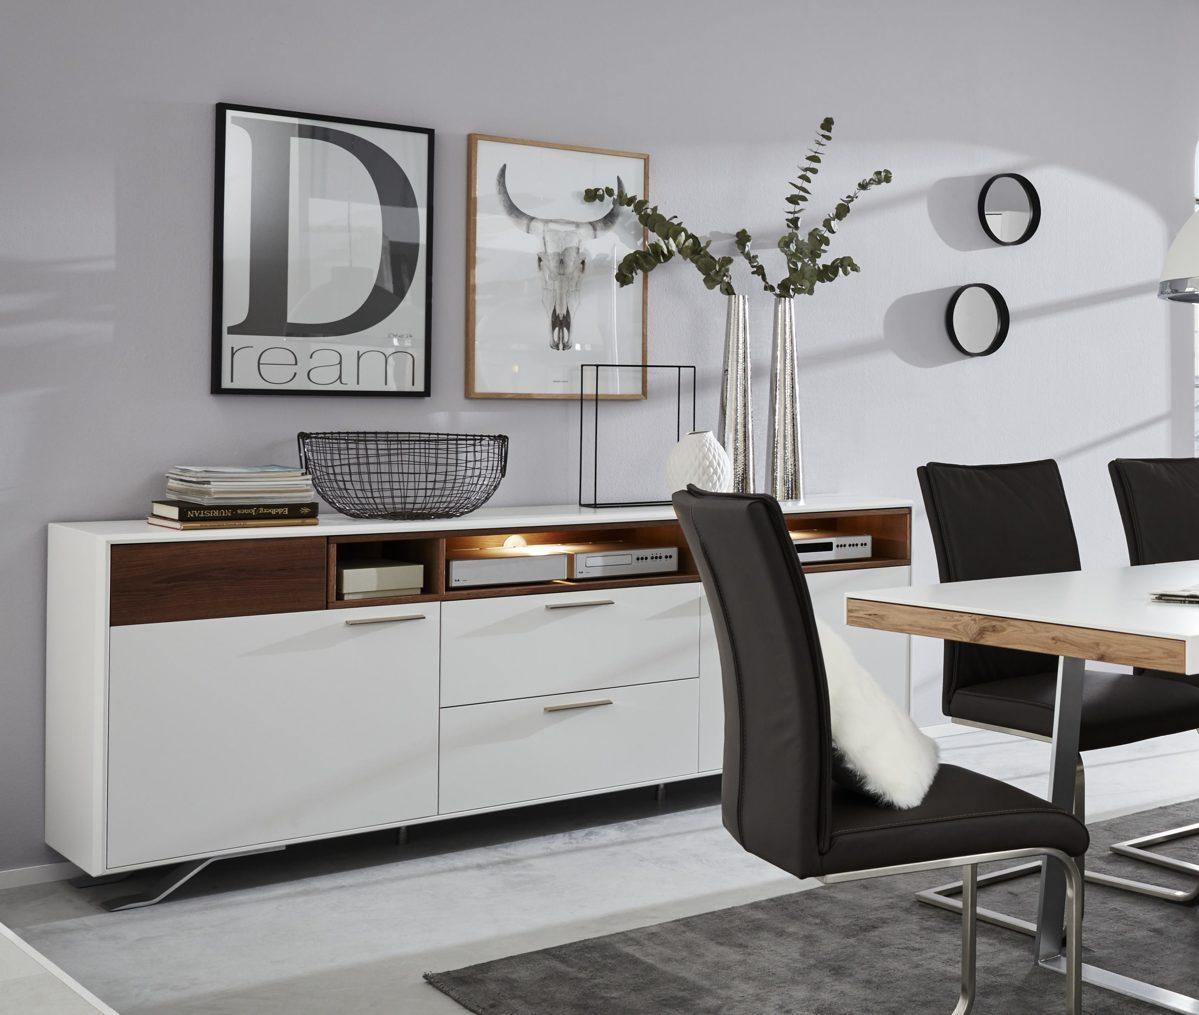 interliving wohnzimmer serie 2102 wandregal mit. Black Bedroom Furniture Sets. Home Design Ideas